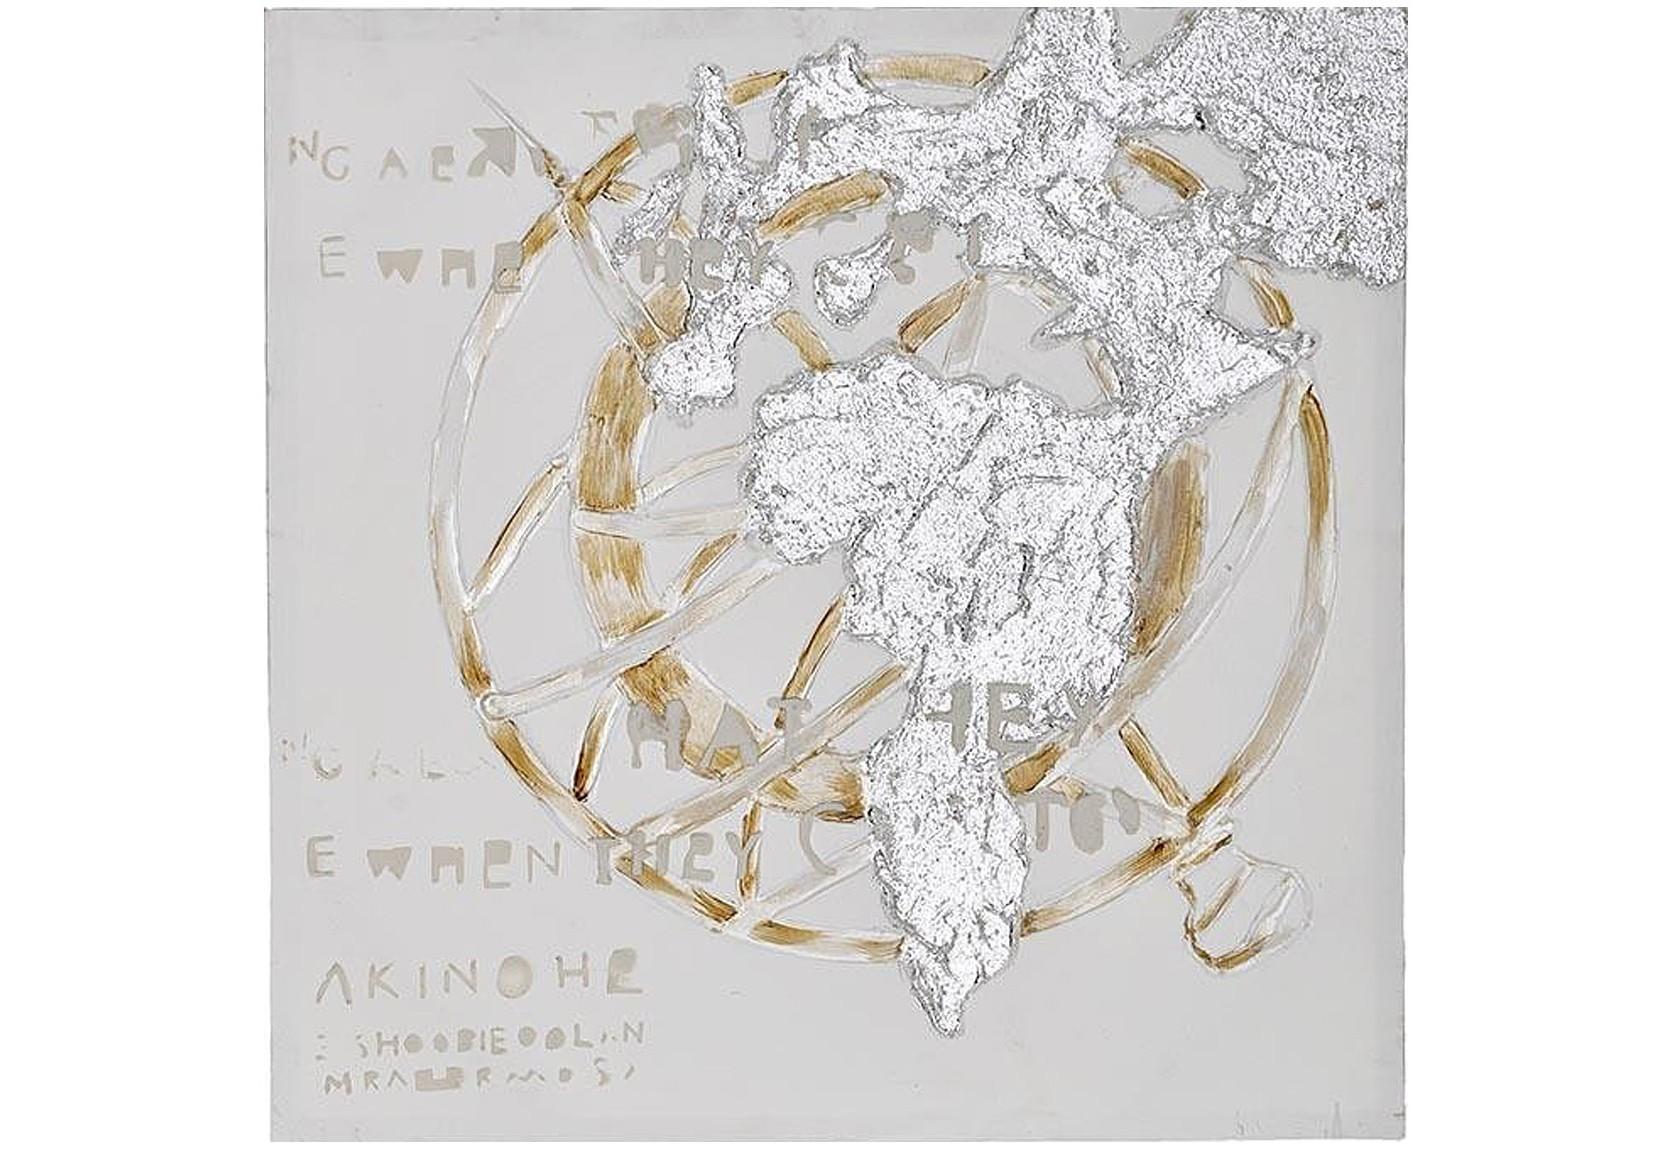 Картина на подрамнике MendozaКартины<br><br><br>Material: Холст<br>Ширина см: 60.0<br>Высота см: 60.0<br>Глубина см: 2.0